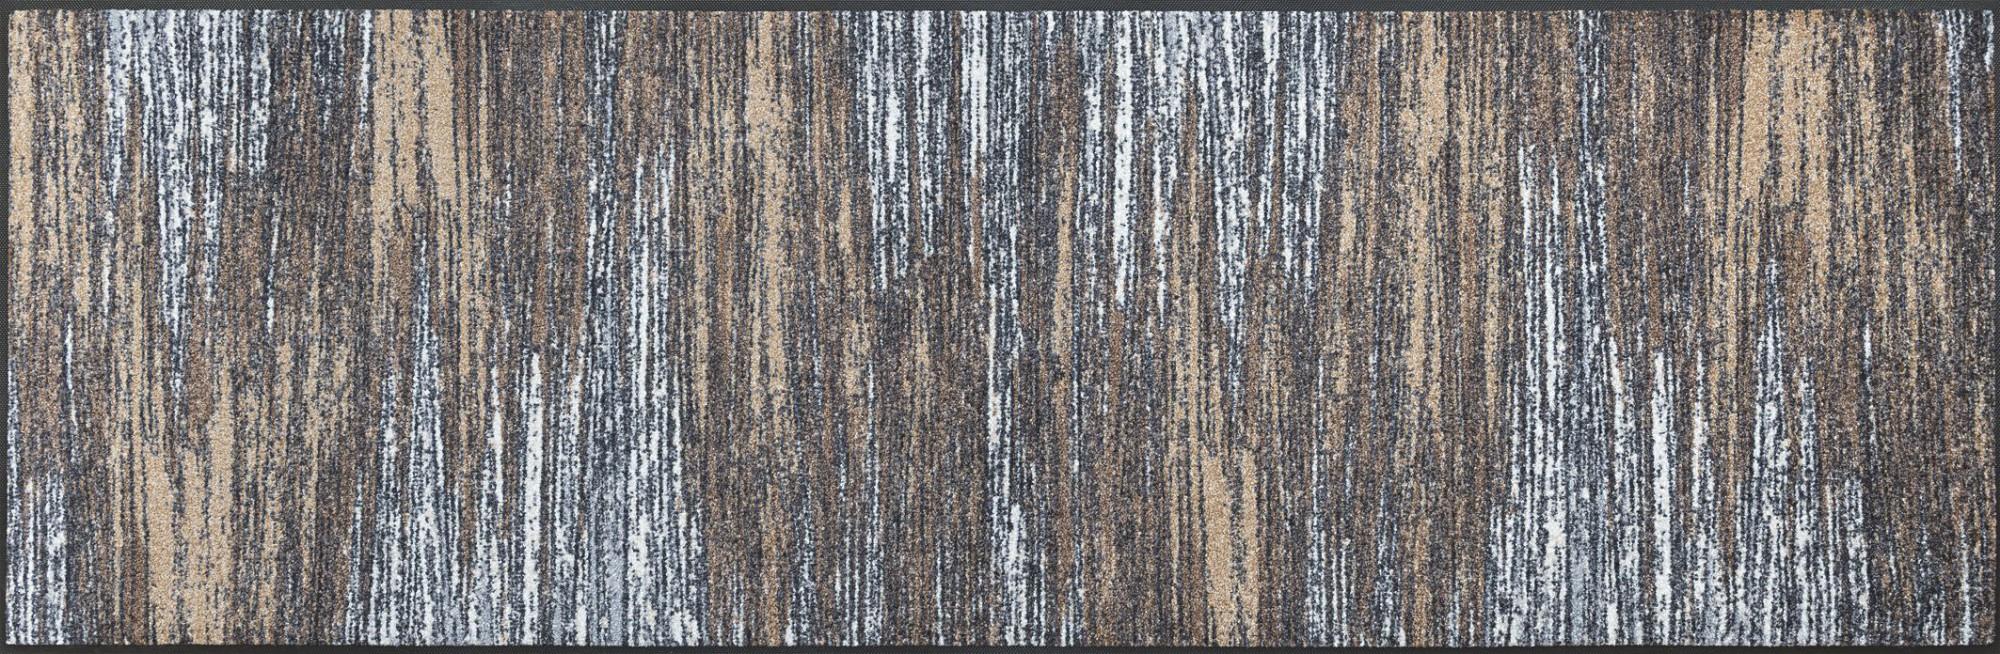 wash dry fu matte scratchy beige waschbare fu matte. Black Bedroom Furniture Sets. Home Design Ideas